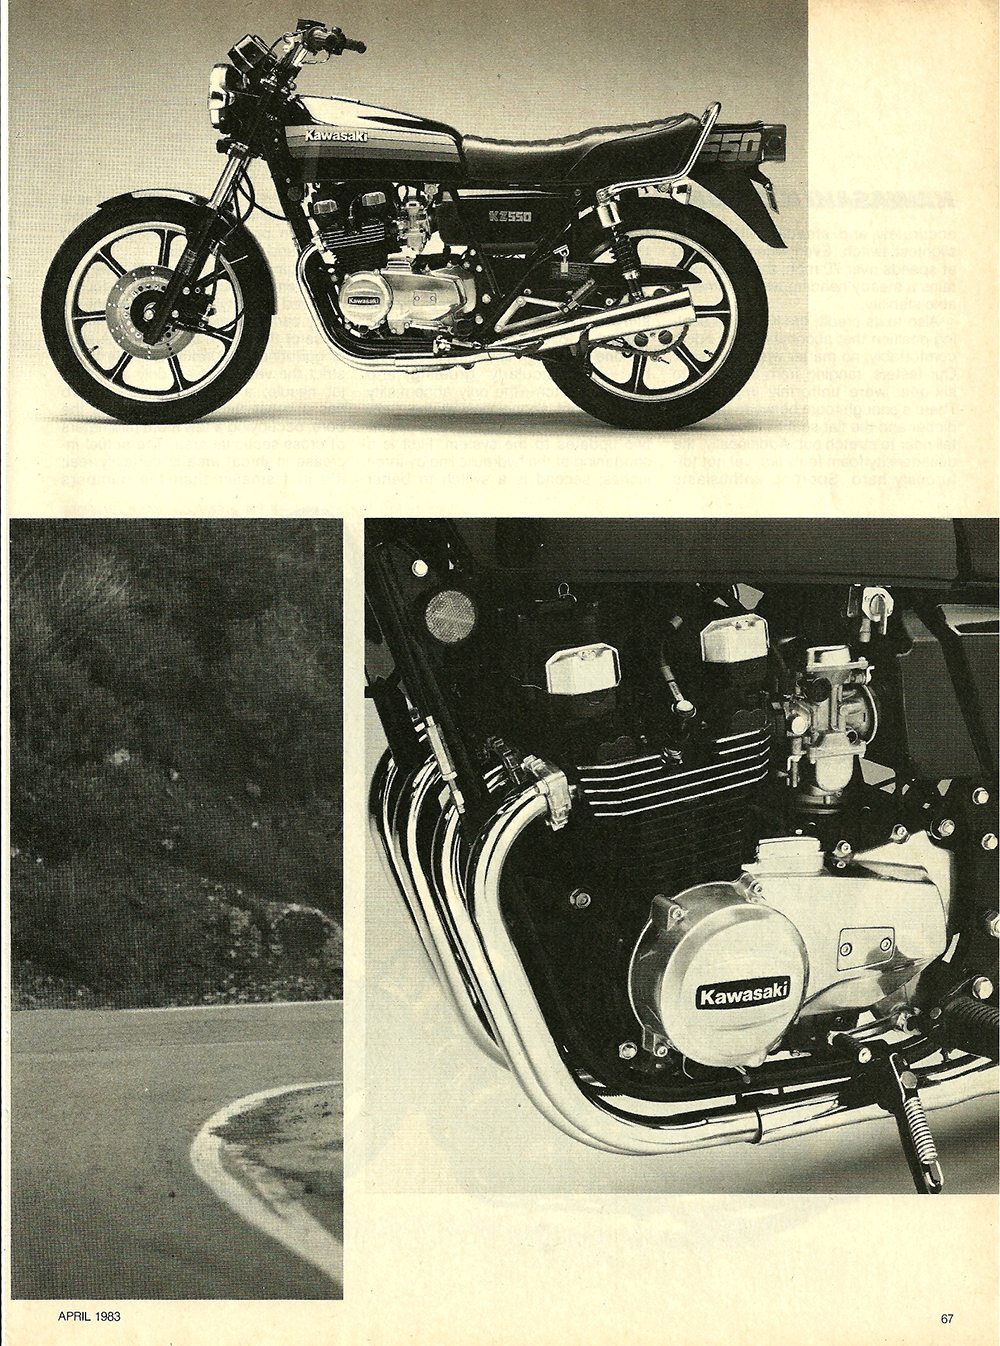 1983 Kawasaki KZ550 A4 road test 3.jpg